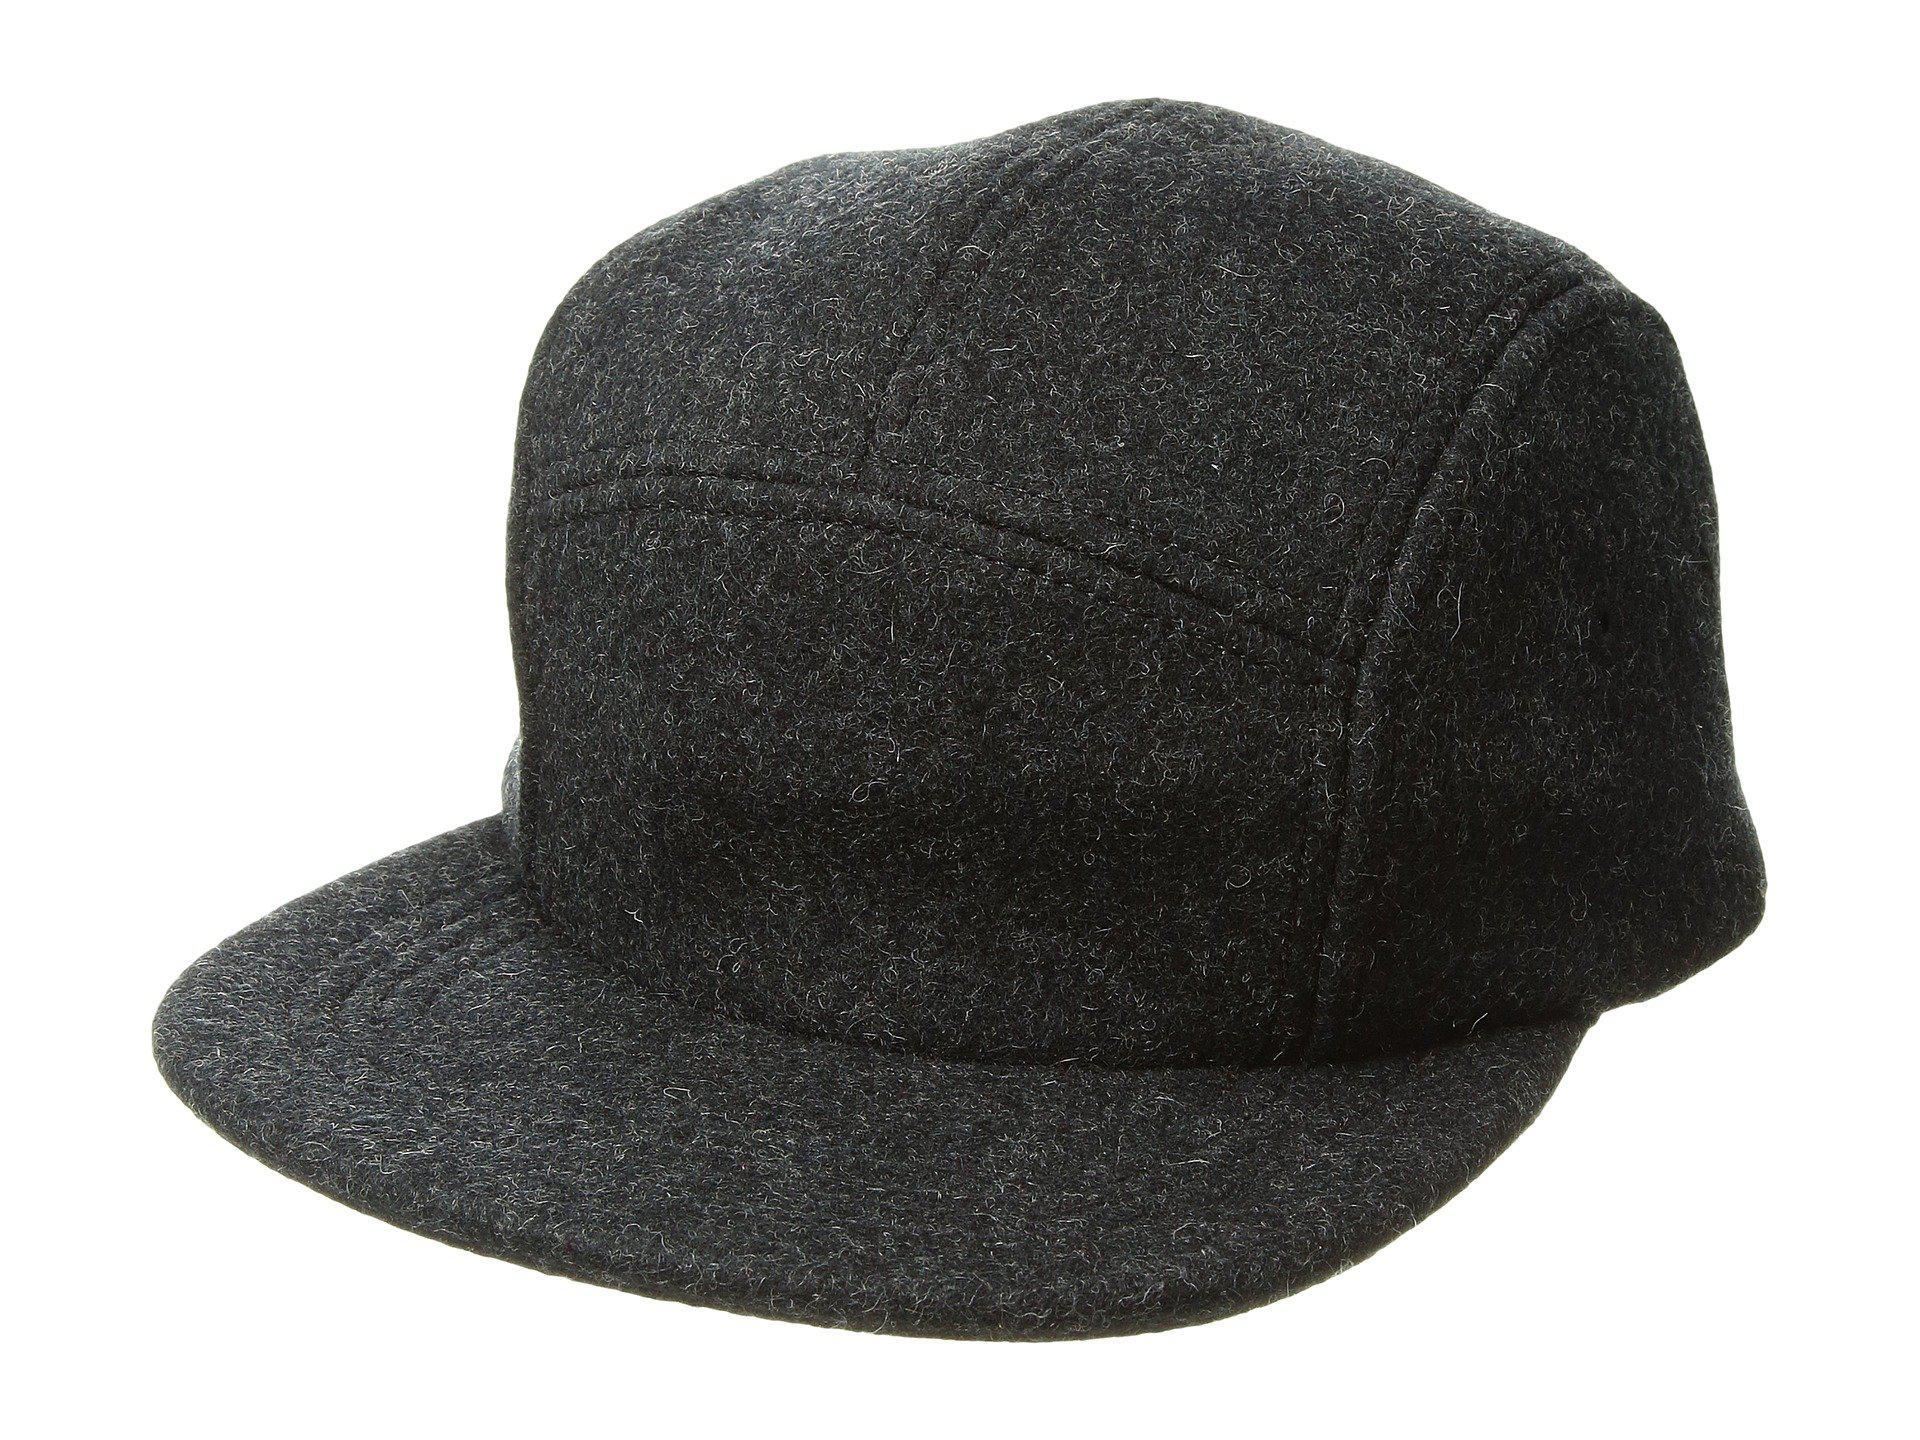 fd07536e6fb Lyst - Filson 5-panel Wool Cap in Gray for Men